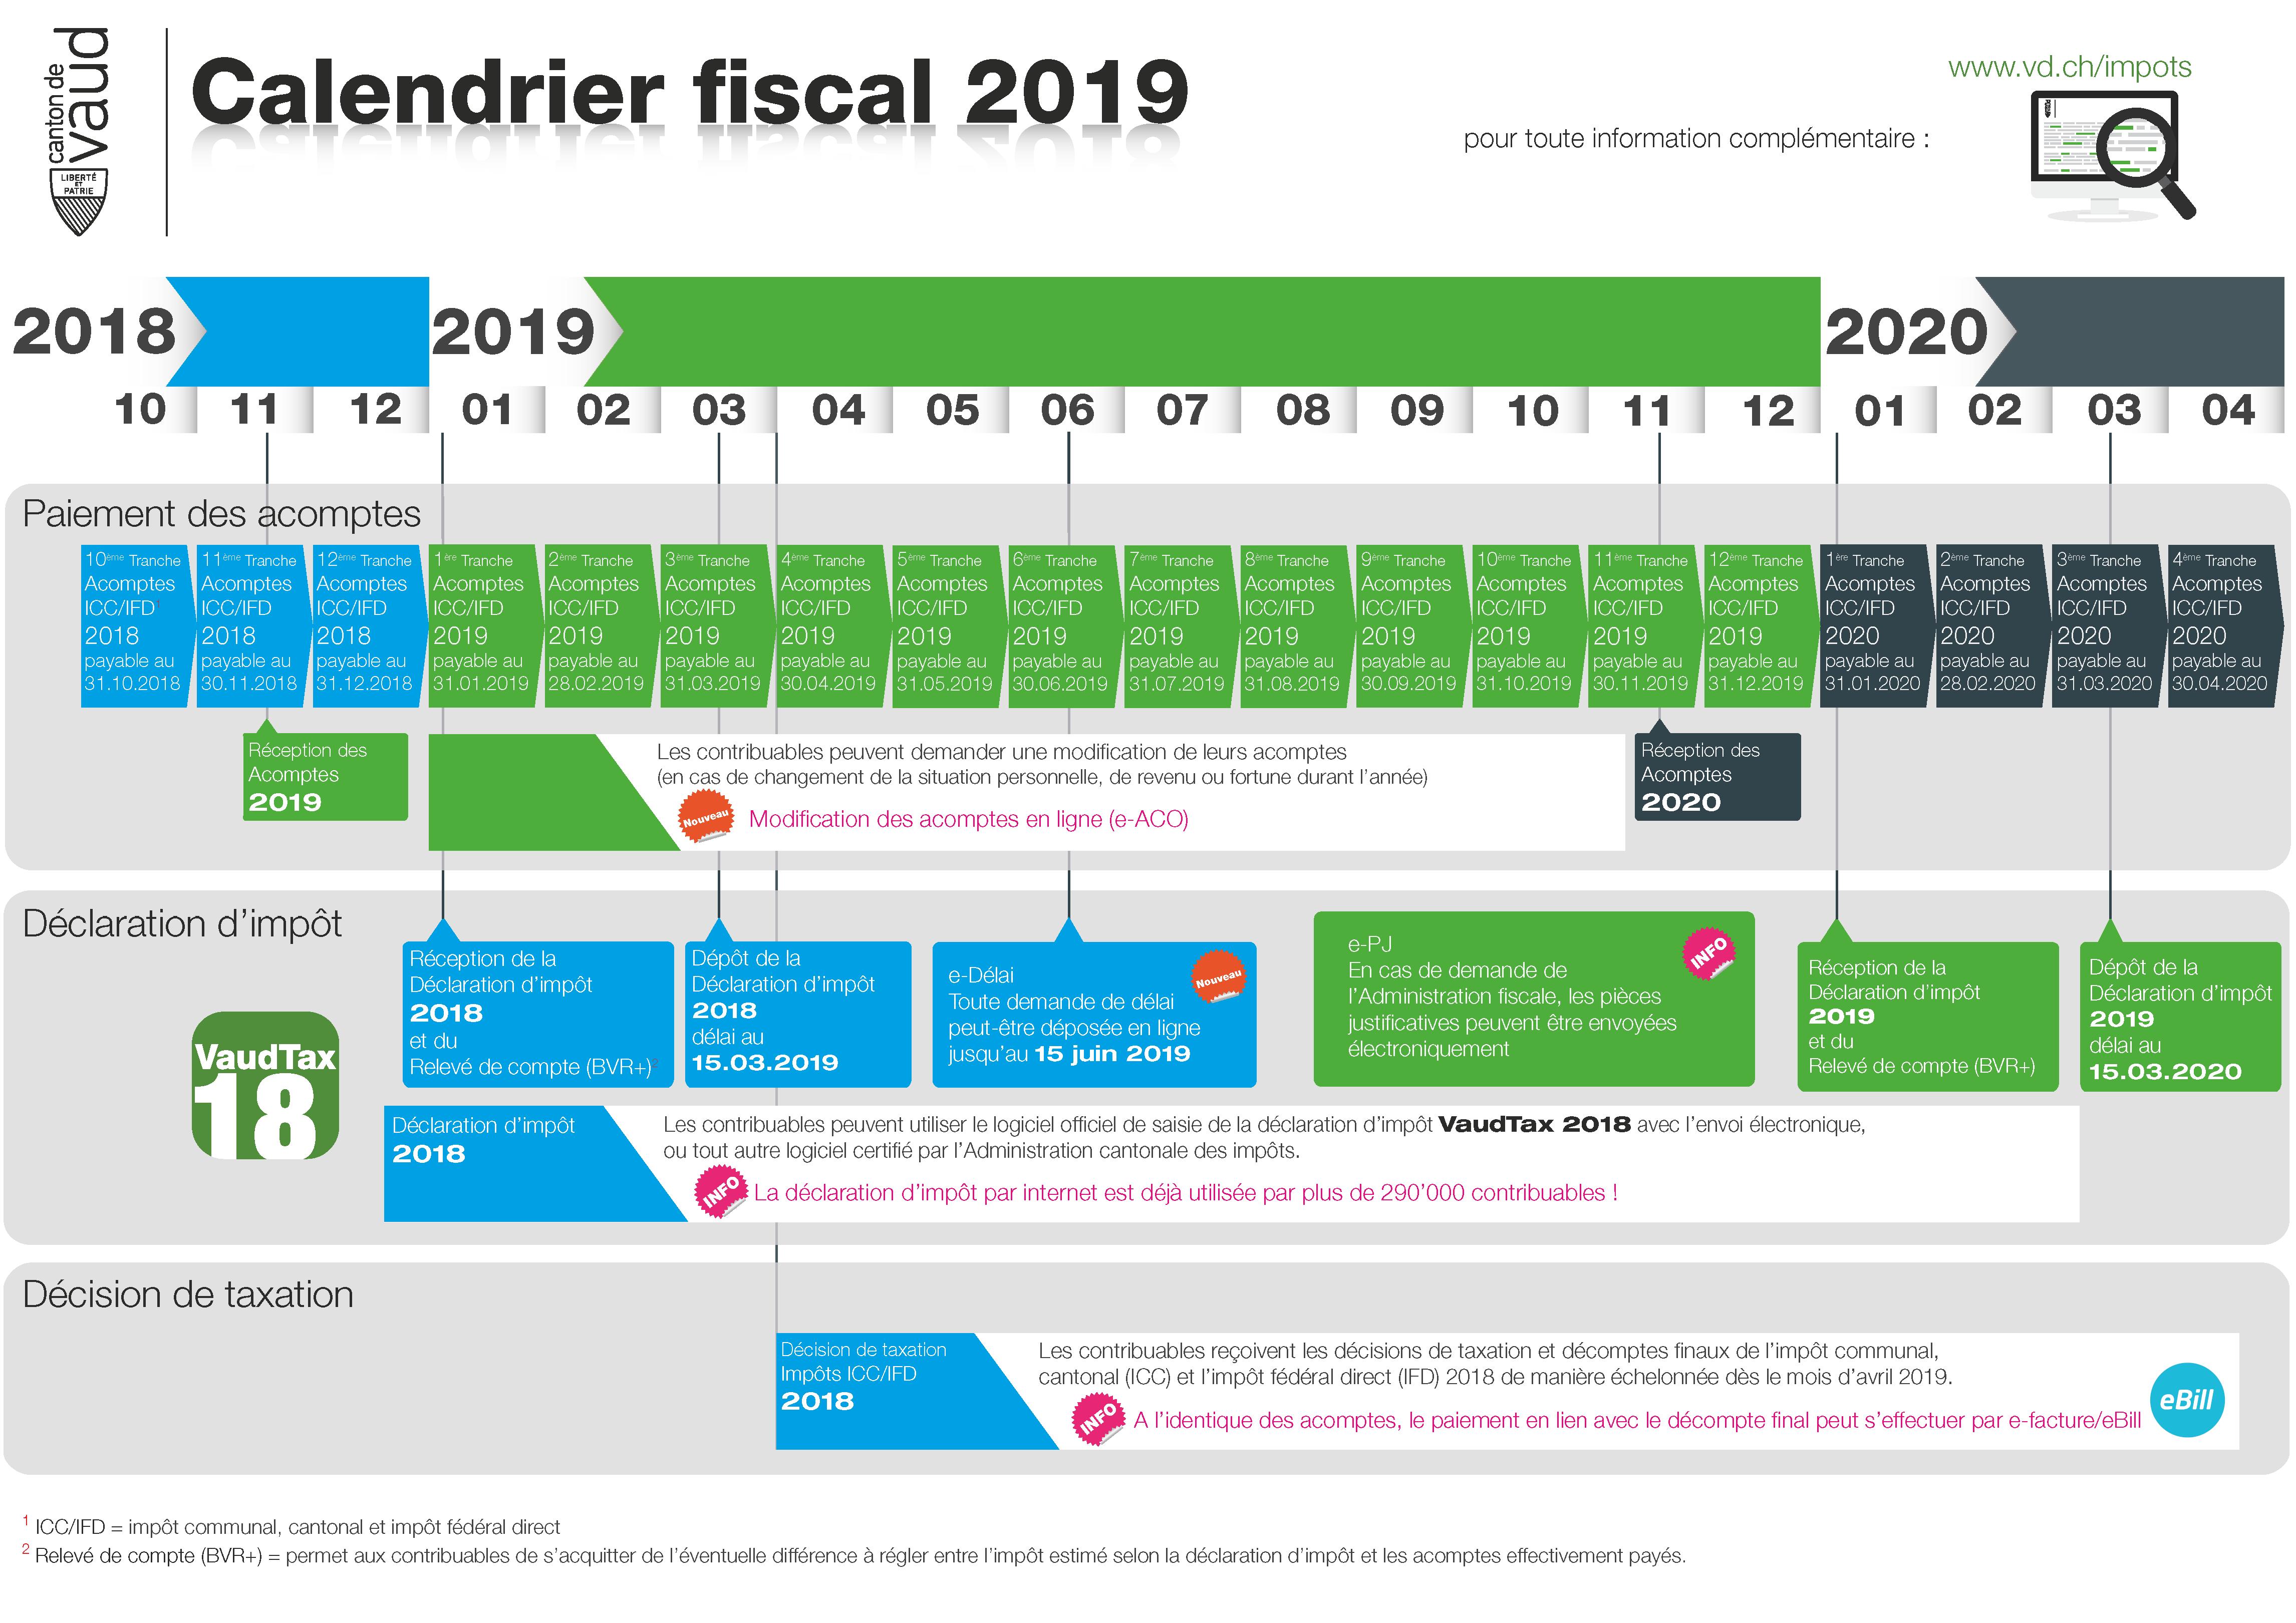 Calendrier Fiscal Entreprise 2020 | Calendrier 2020 modeltreindagen